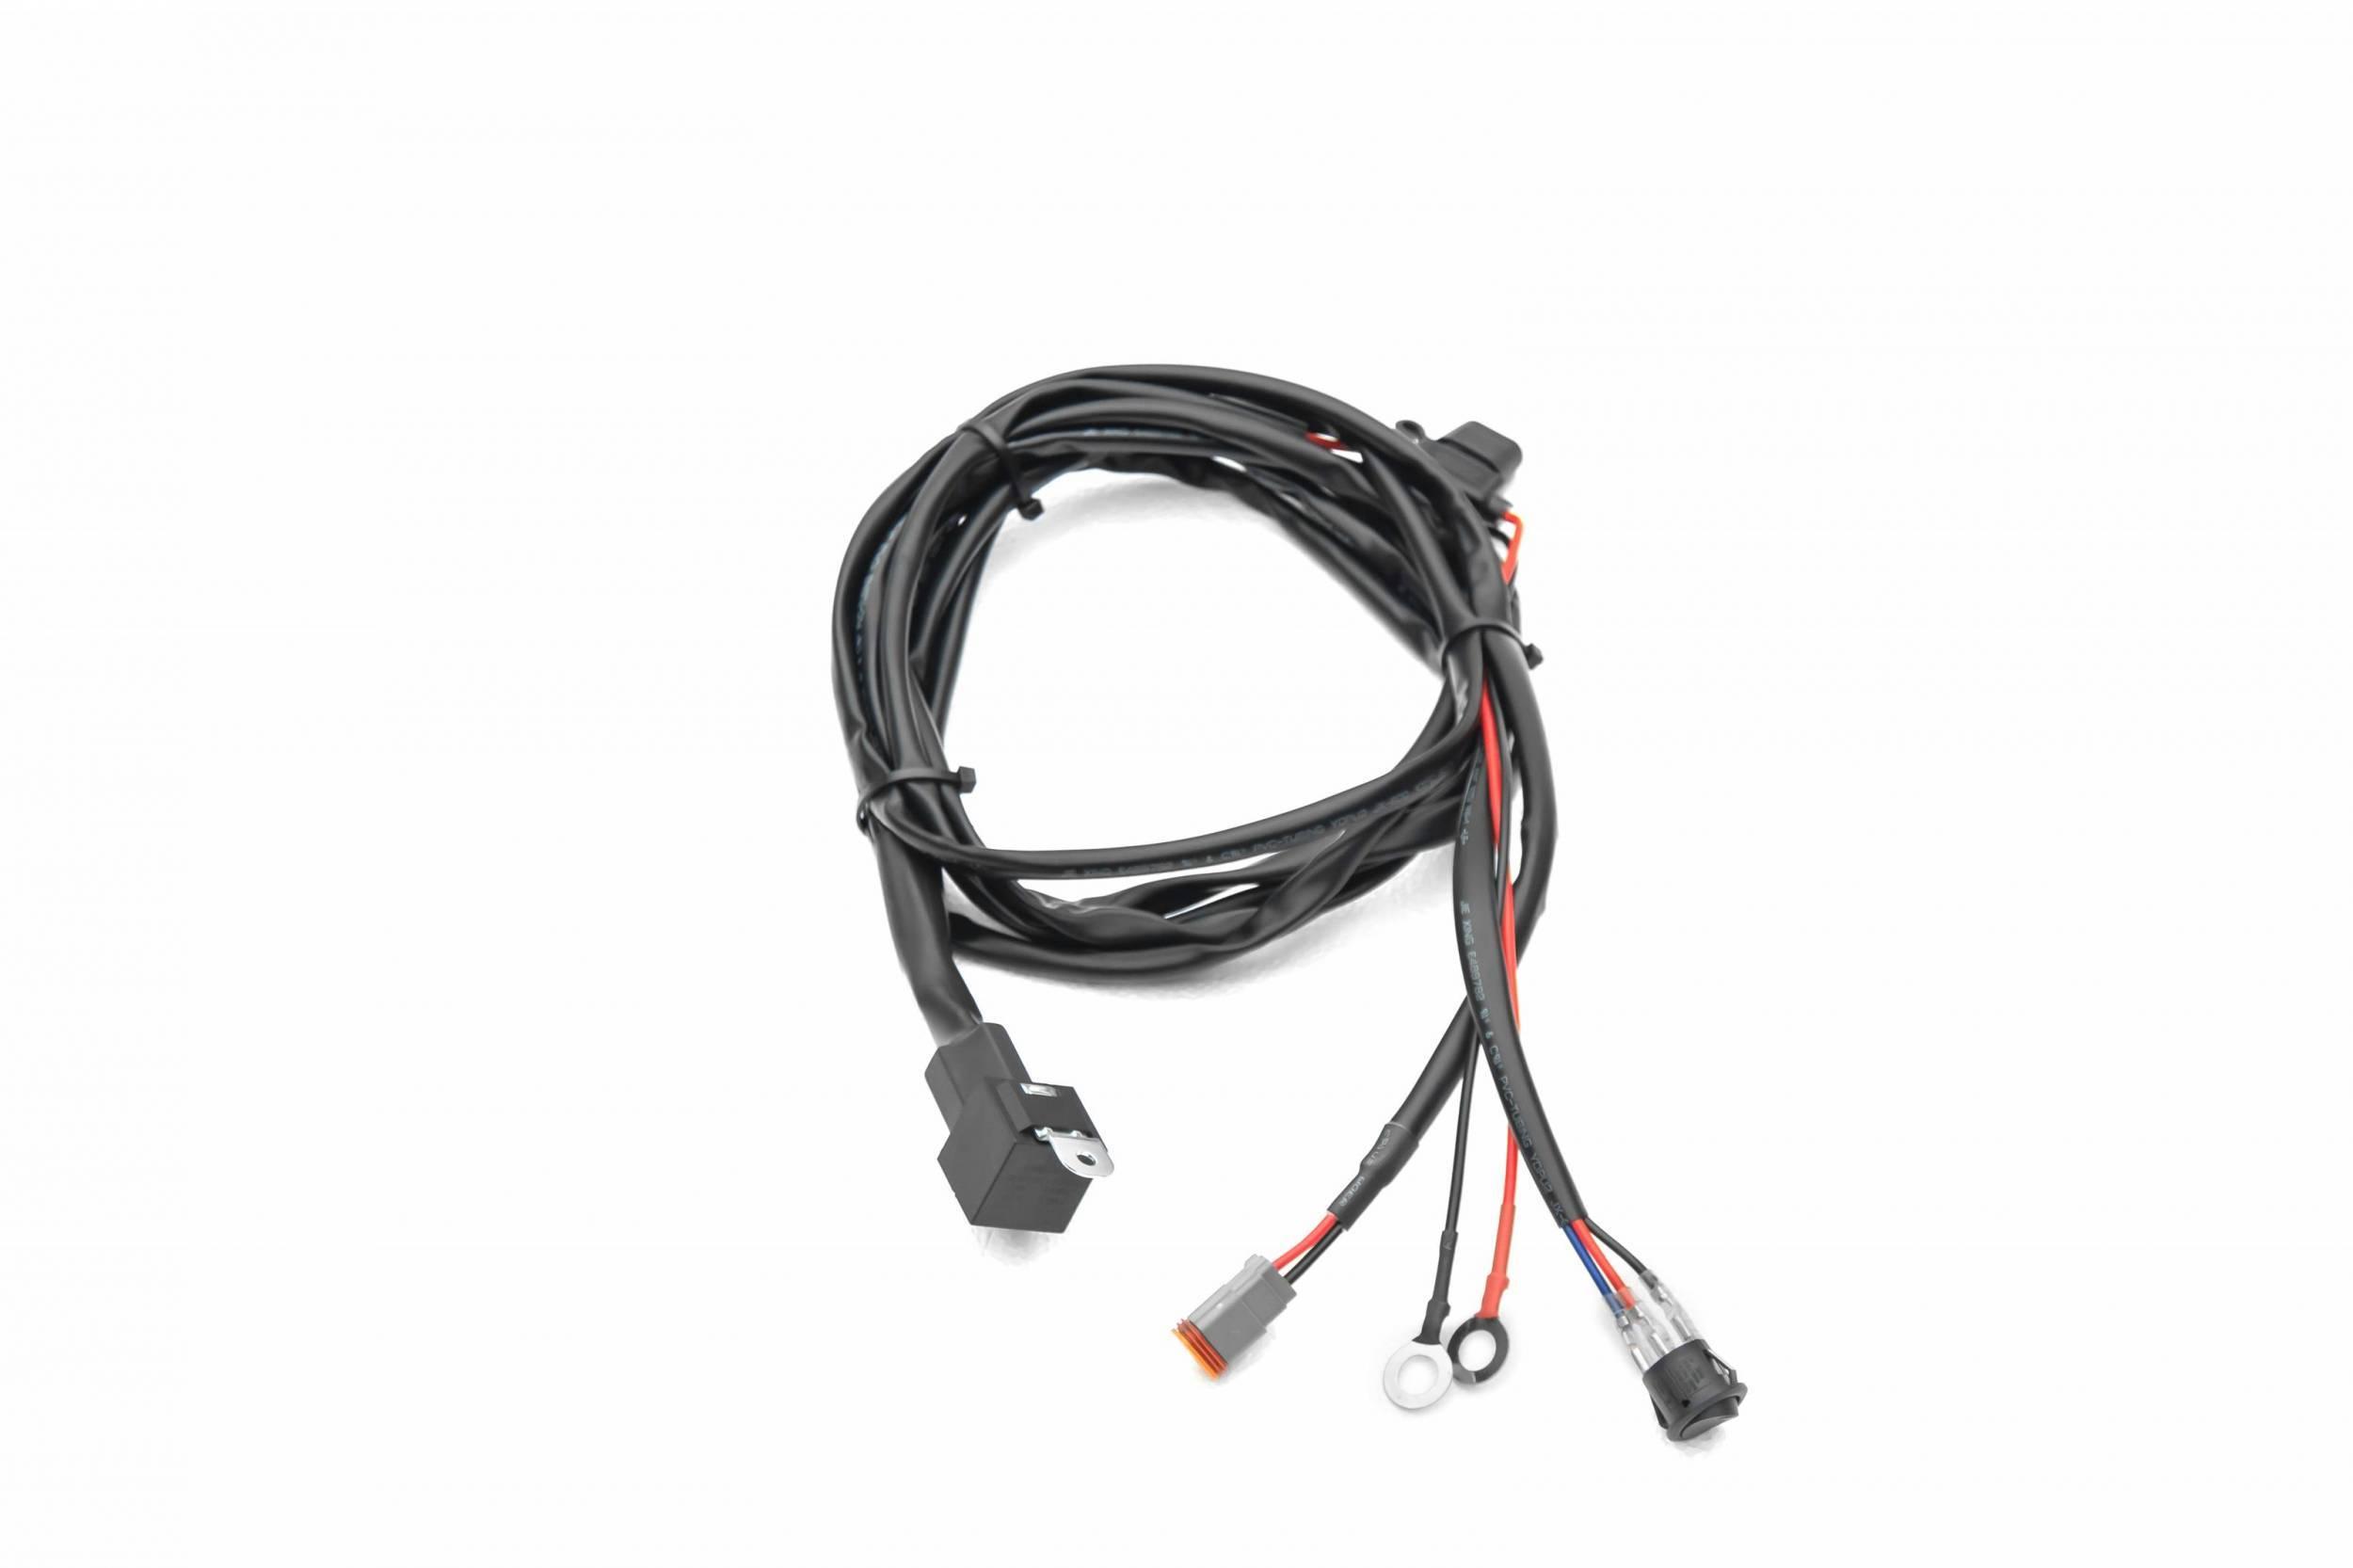 ZROADZ - Universal DT Series Wiring Harness - PN #Z390020S-A